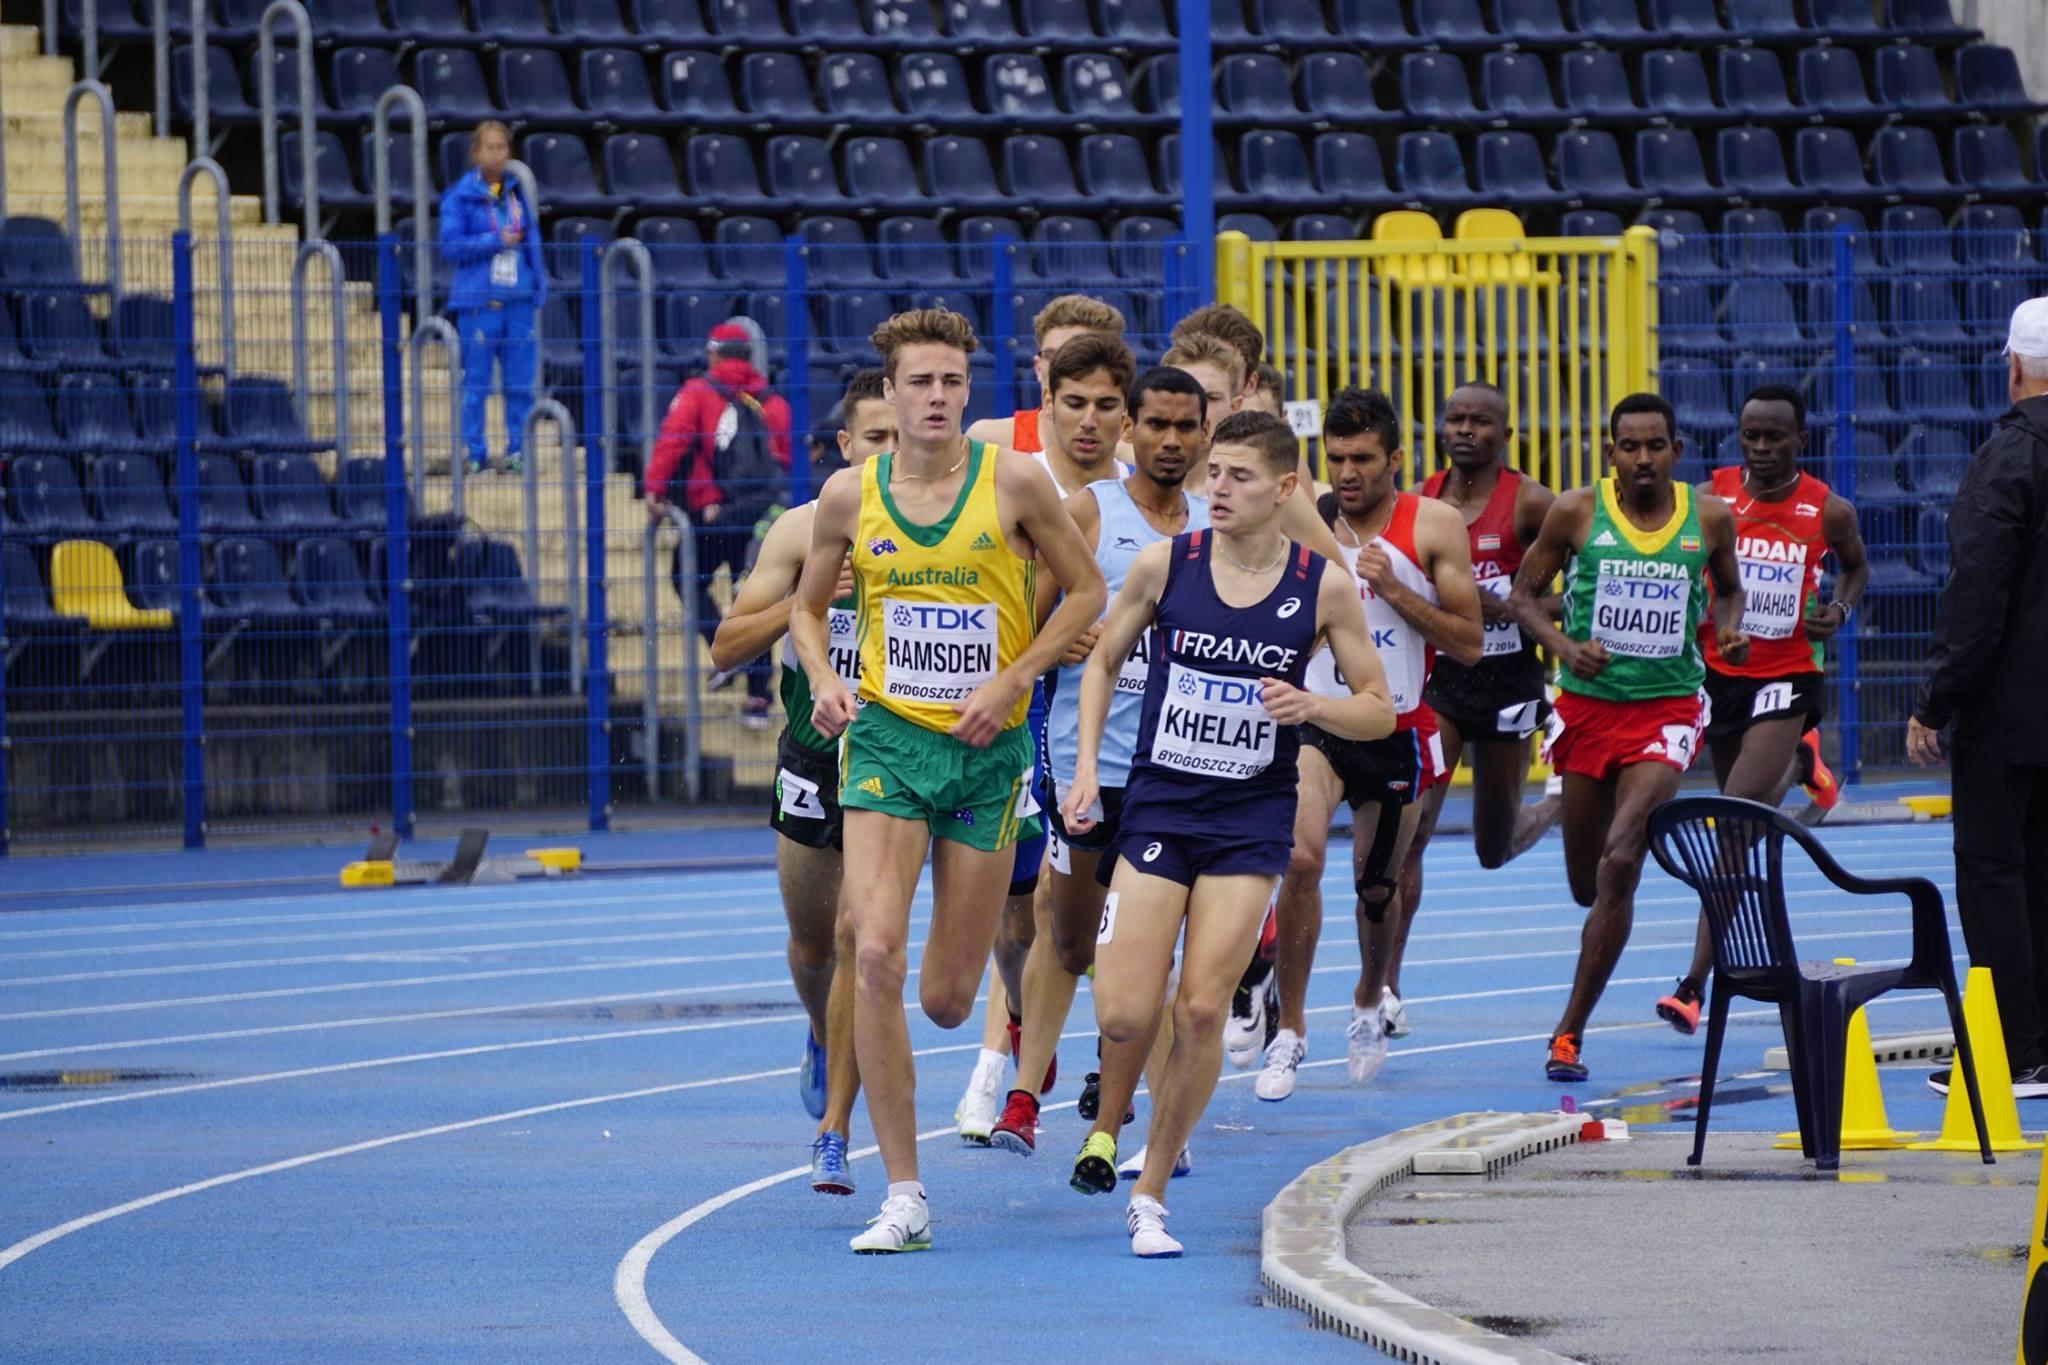 Matthew Ramsden at Stadion Zawisza Bydgoszcz: Picture thanks to Athletics Australia